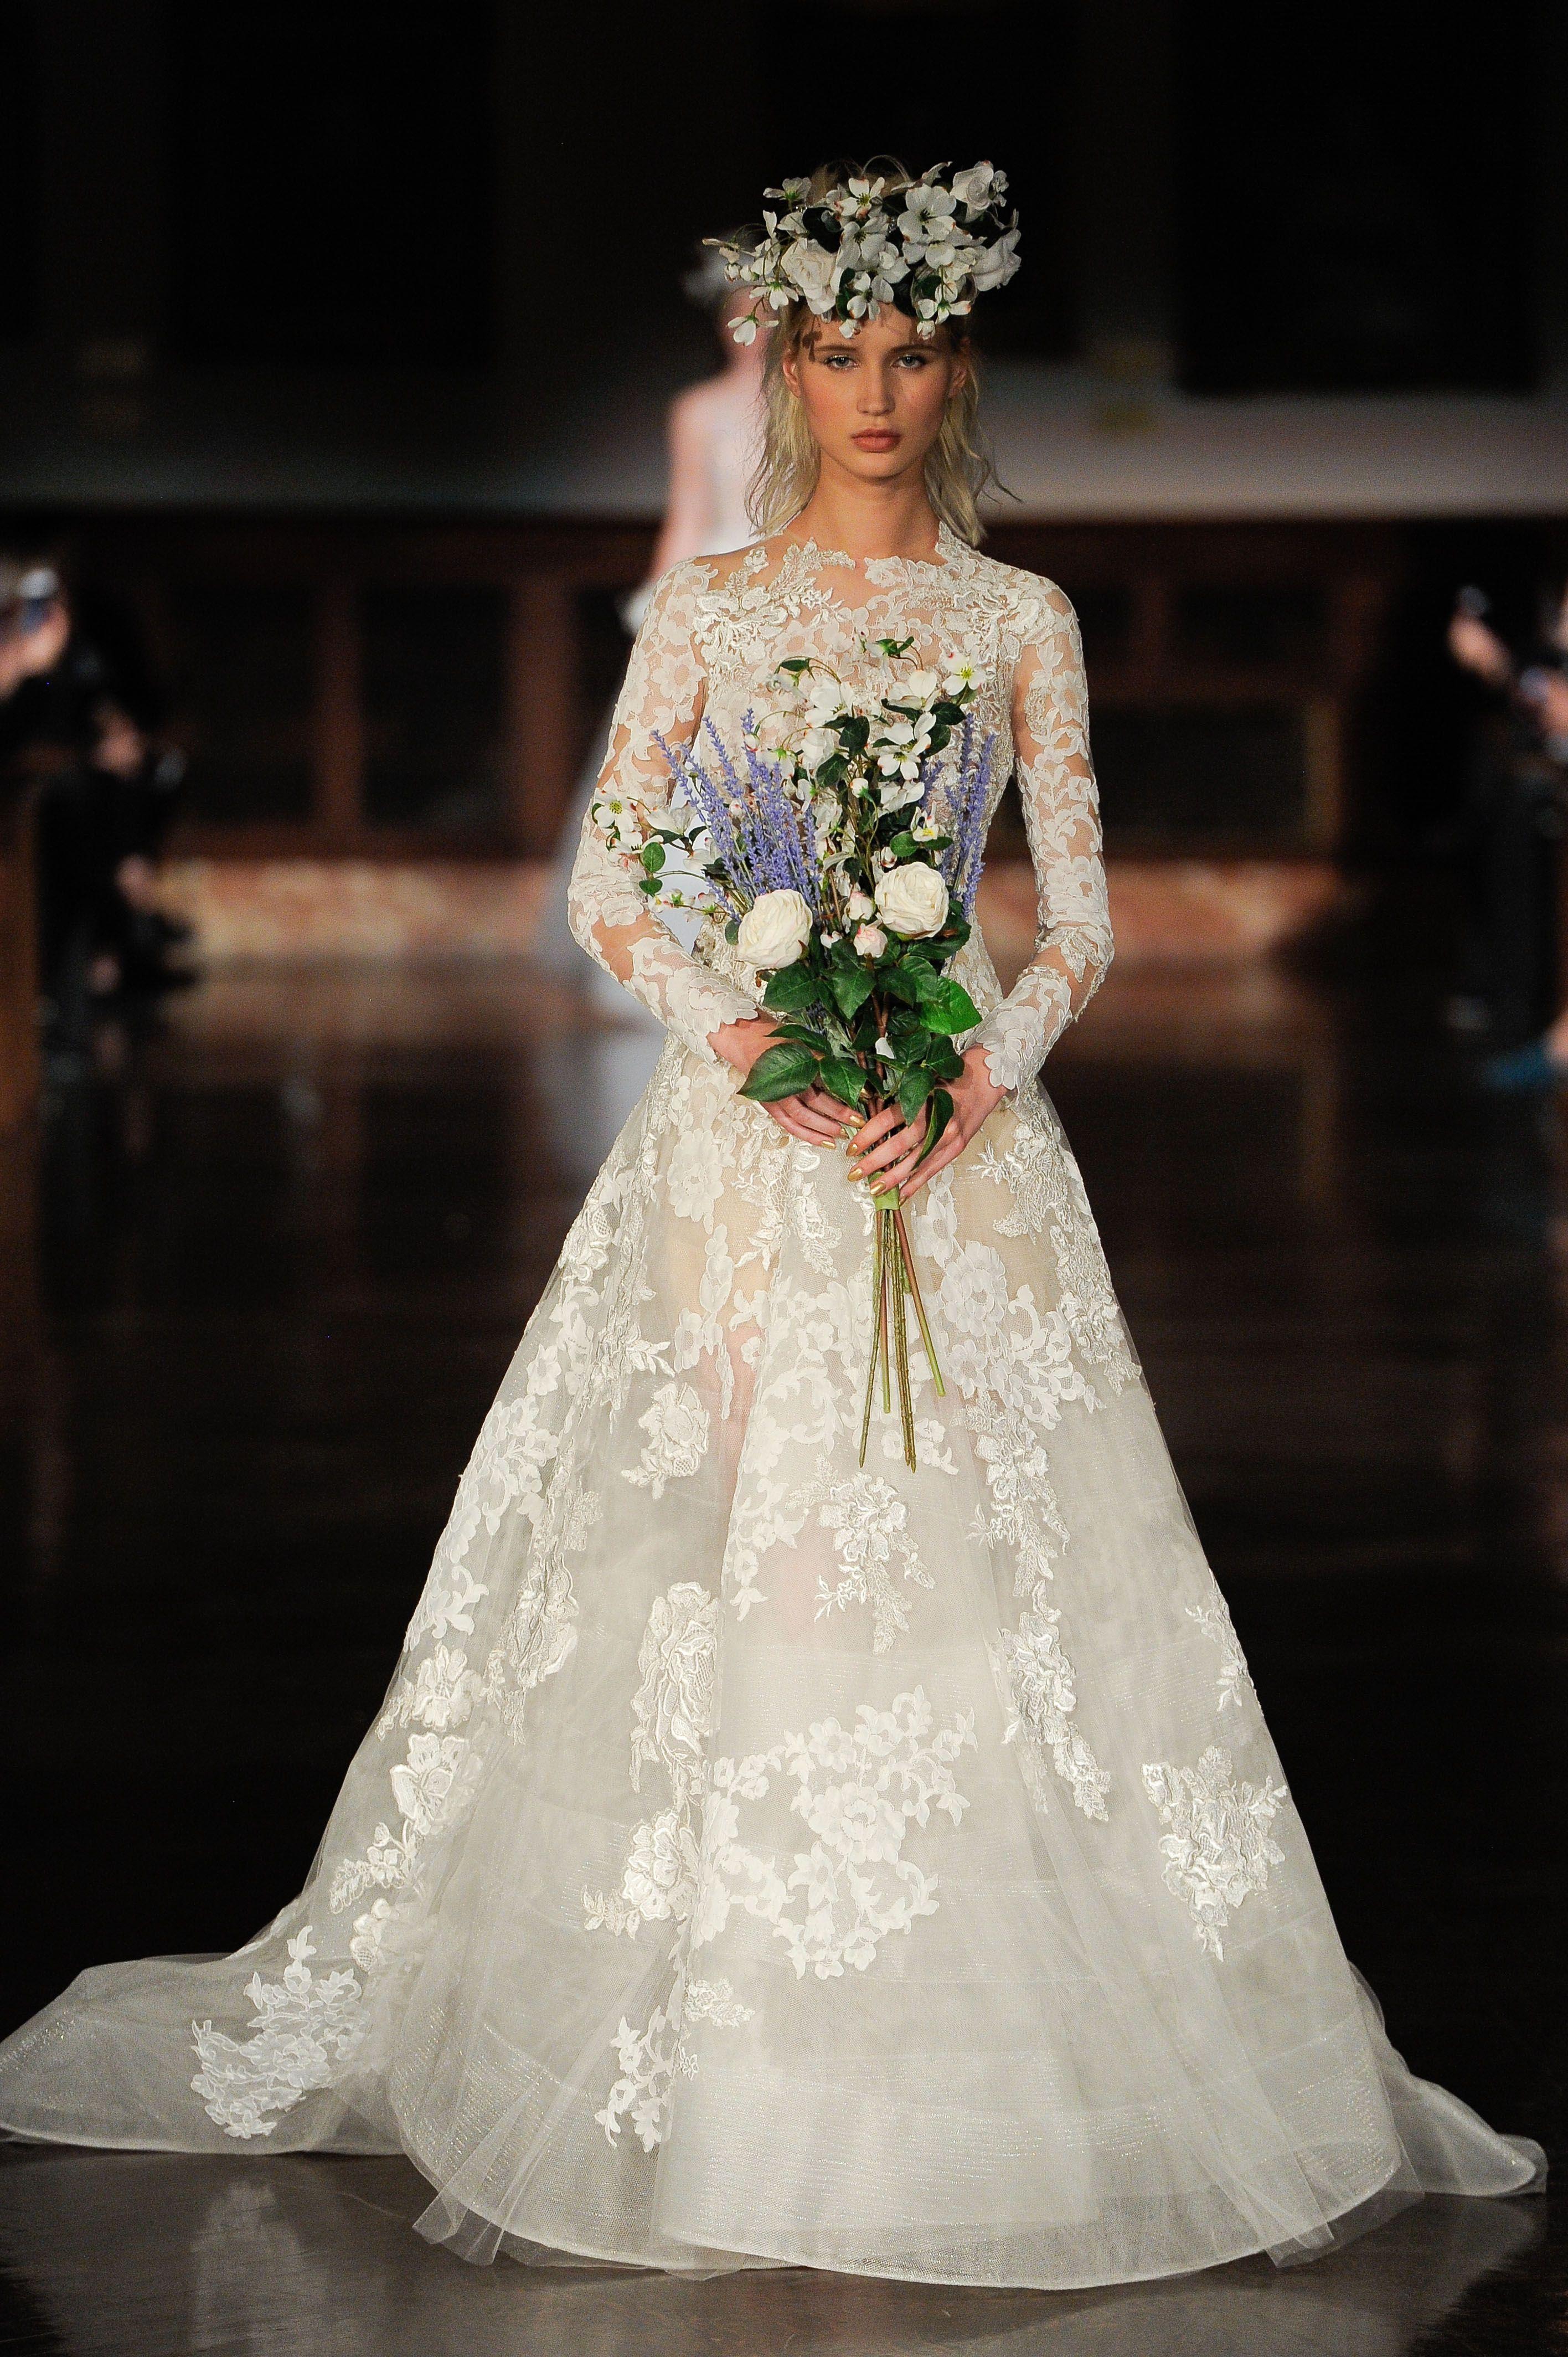 Reem Acra Bridal Collection Reem Acra Bridal Fashion Week Spring 2019 New York City Ap Reem Acra Wedding Dress Boho Wedding Dress Wedding Dress Organza